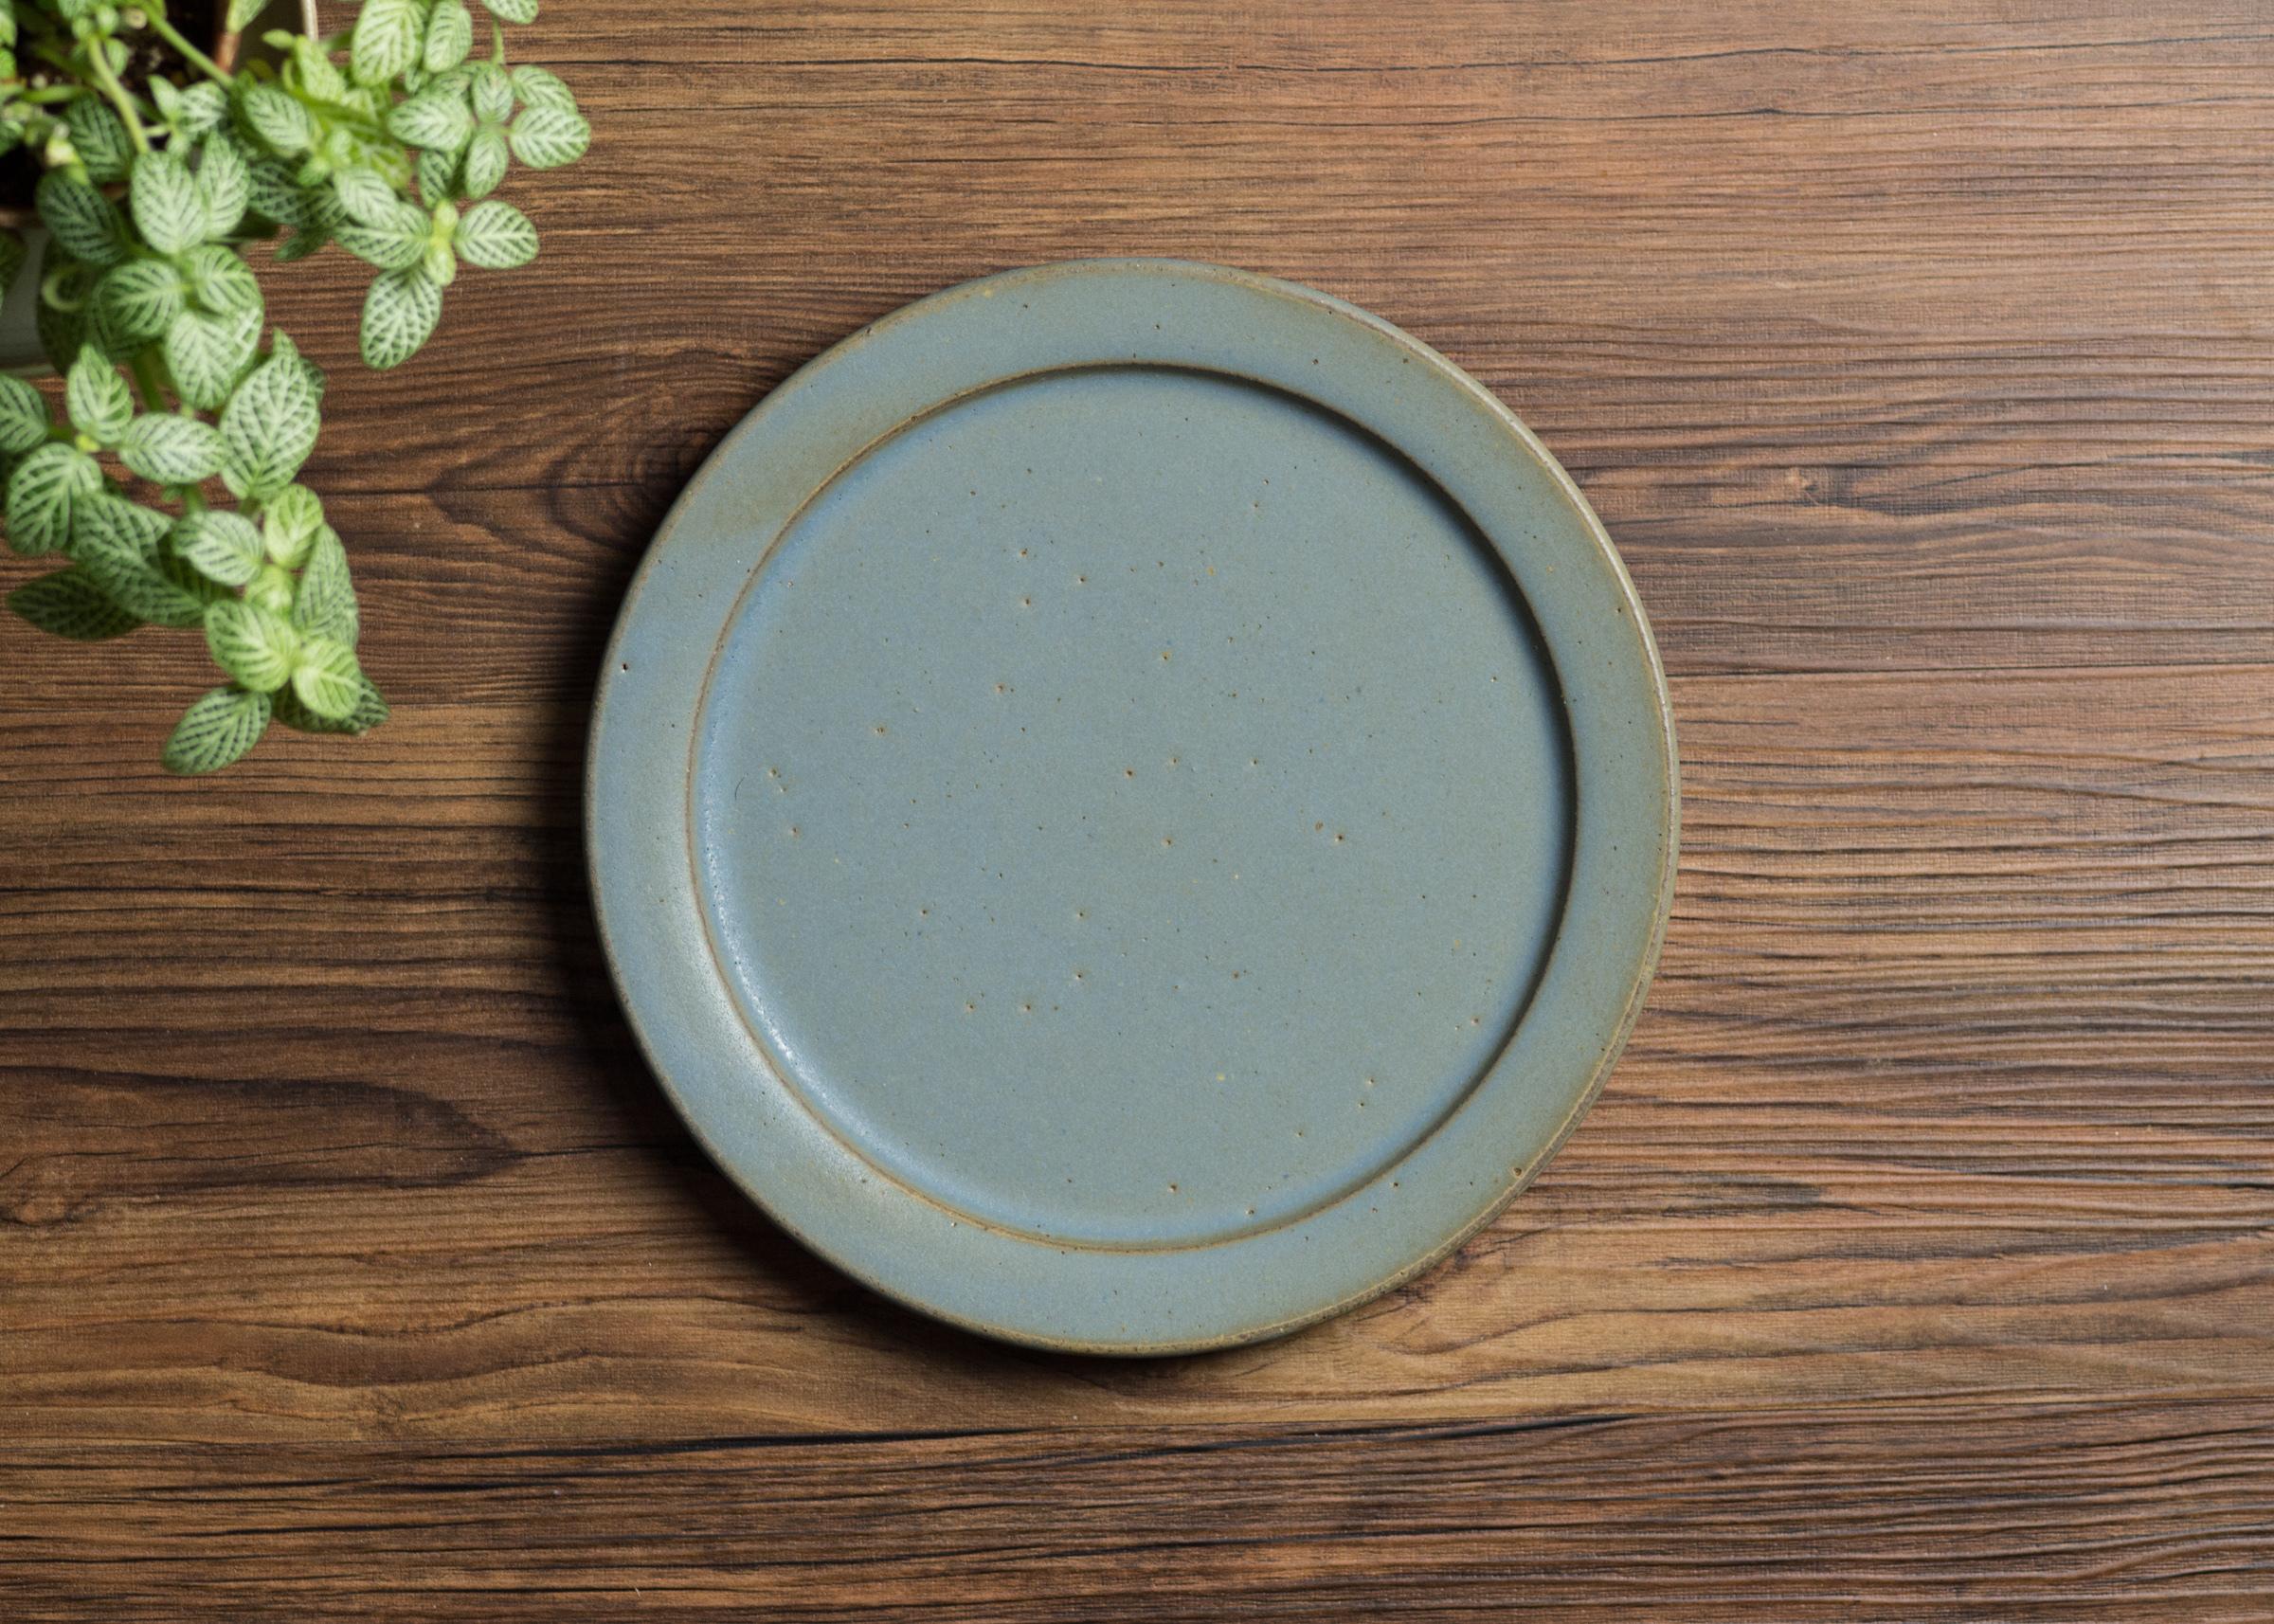 SHIROUMA 洋皿 21cm 灰色 中皿 プレート/長谷川 哲也